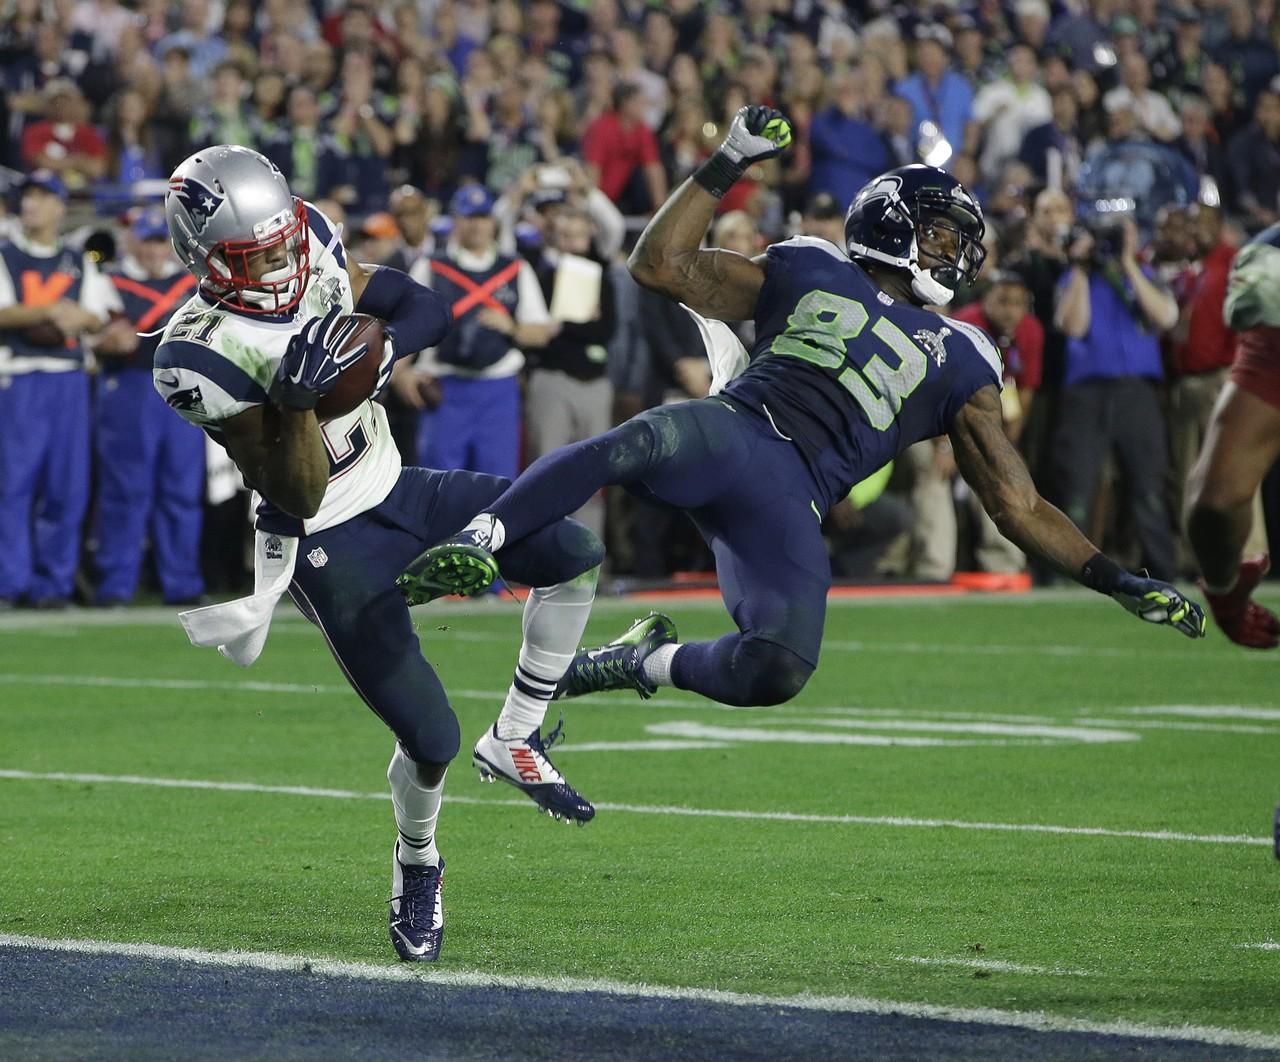 Who Won the Marketing Super Bowl?